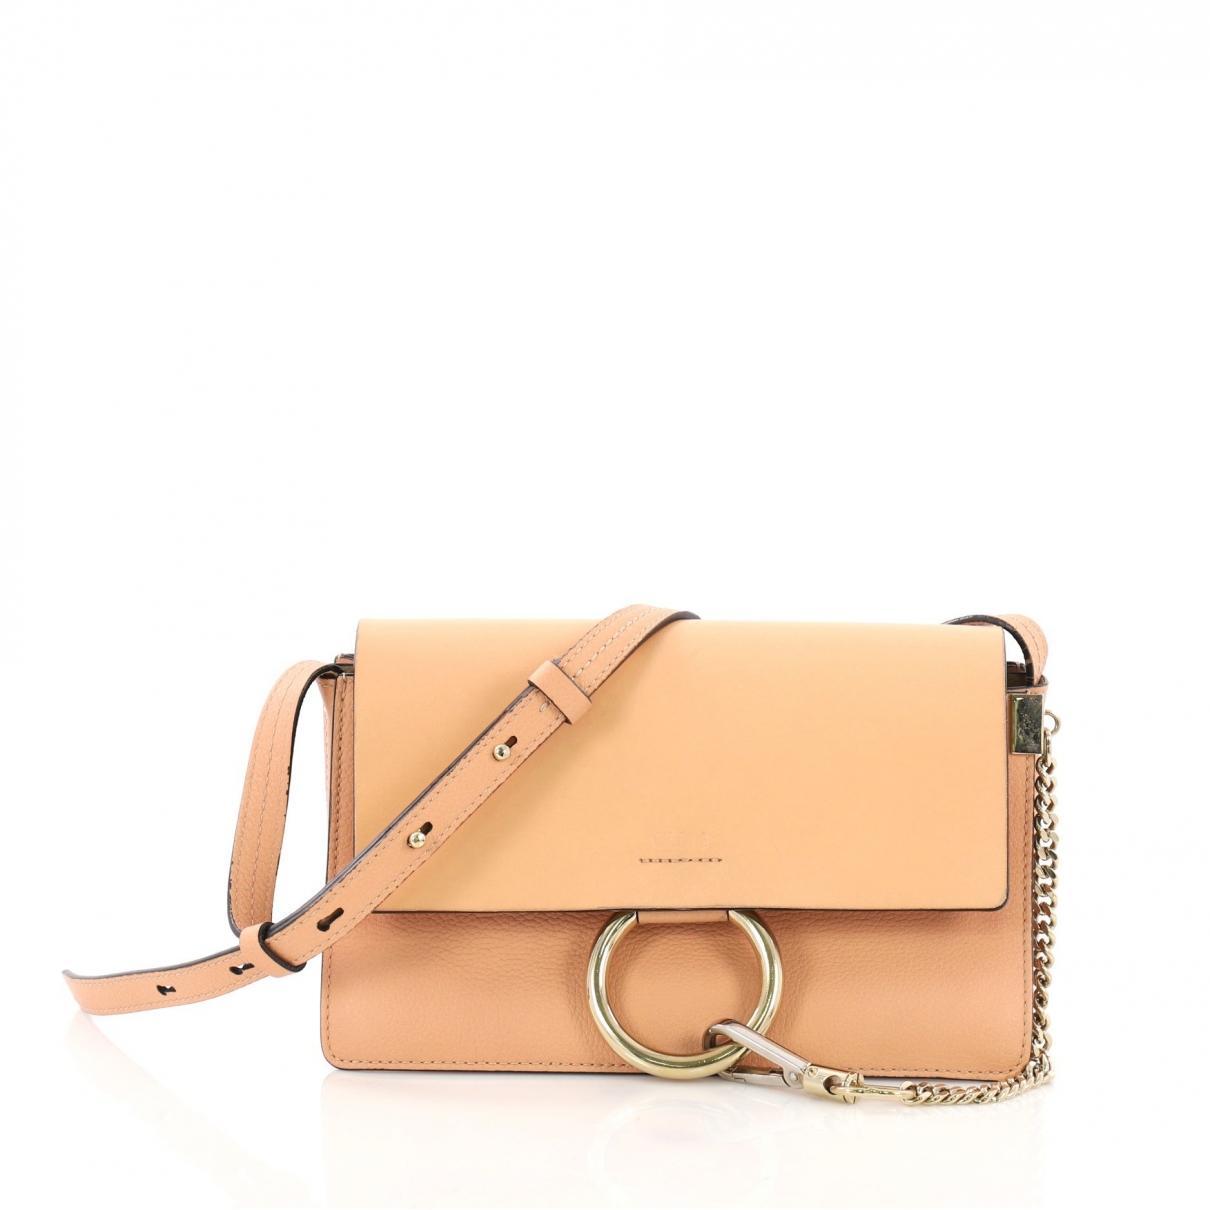 Chloé Leather Lyst Handbag Brown In Faye KcFJl1